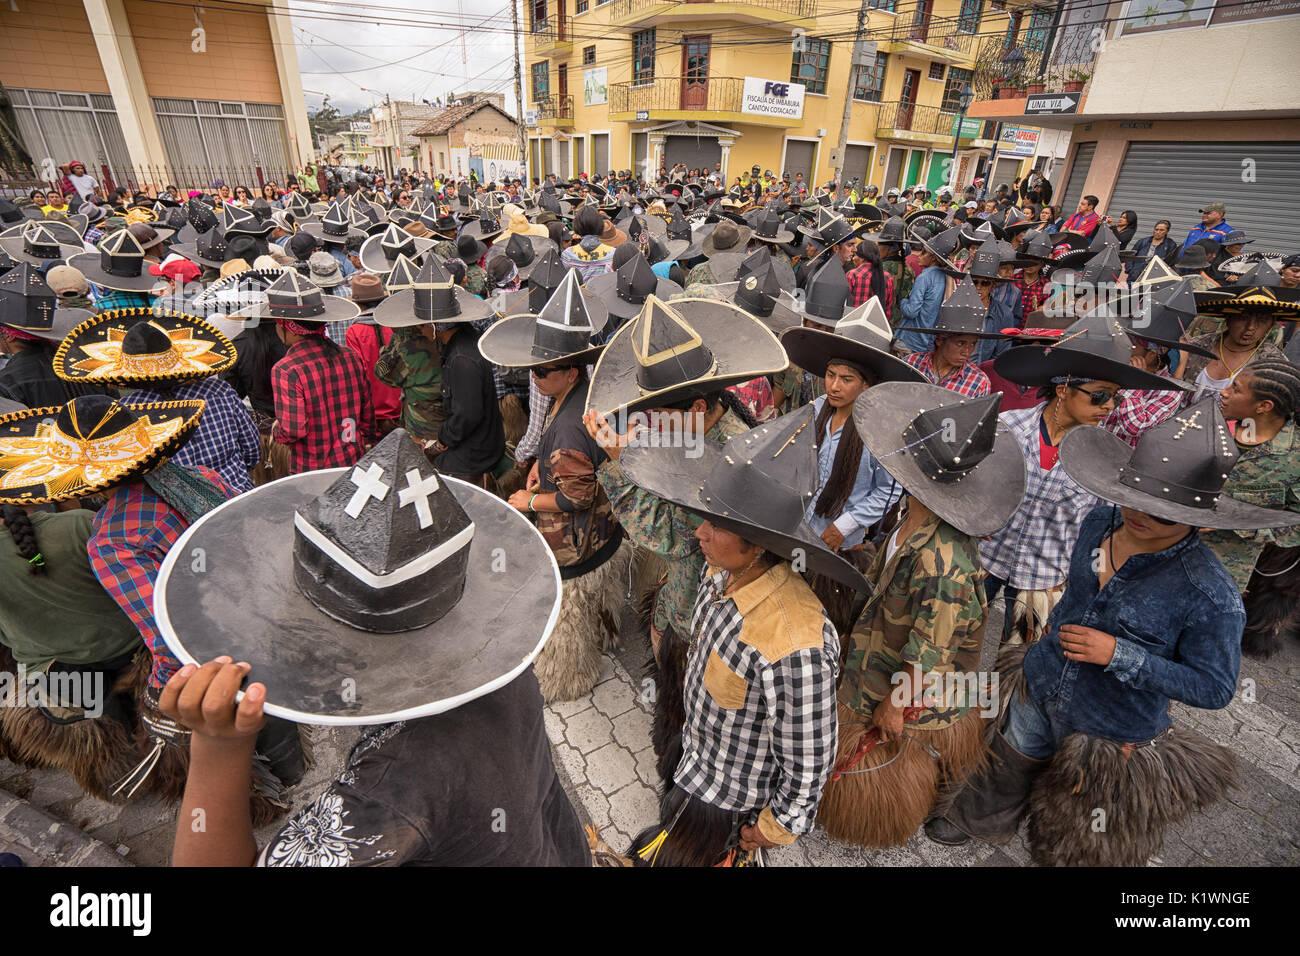 June 24, 2017 Cotacachi, Ecuador: aindigenous kichwa men dancing at the Inti Raymi parade at summer solstice - Stock Image